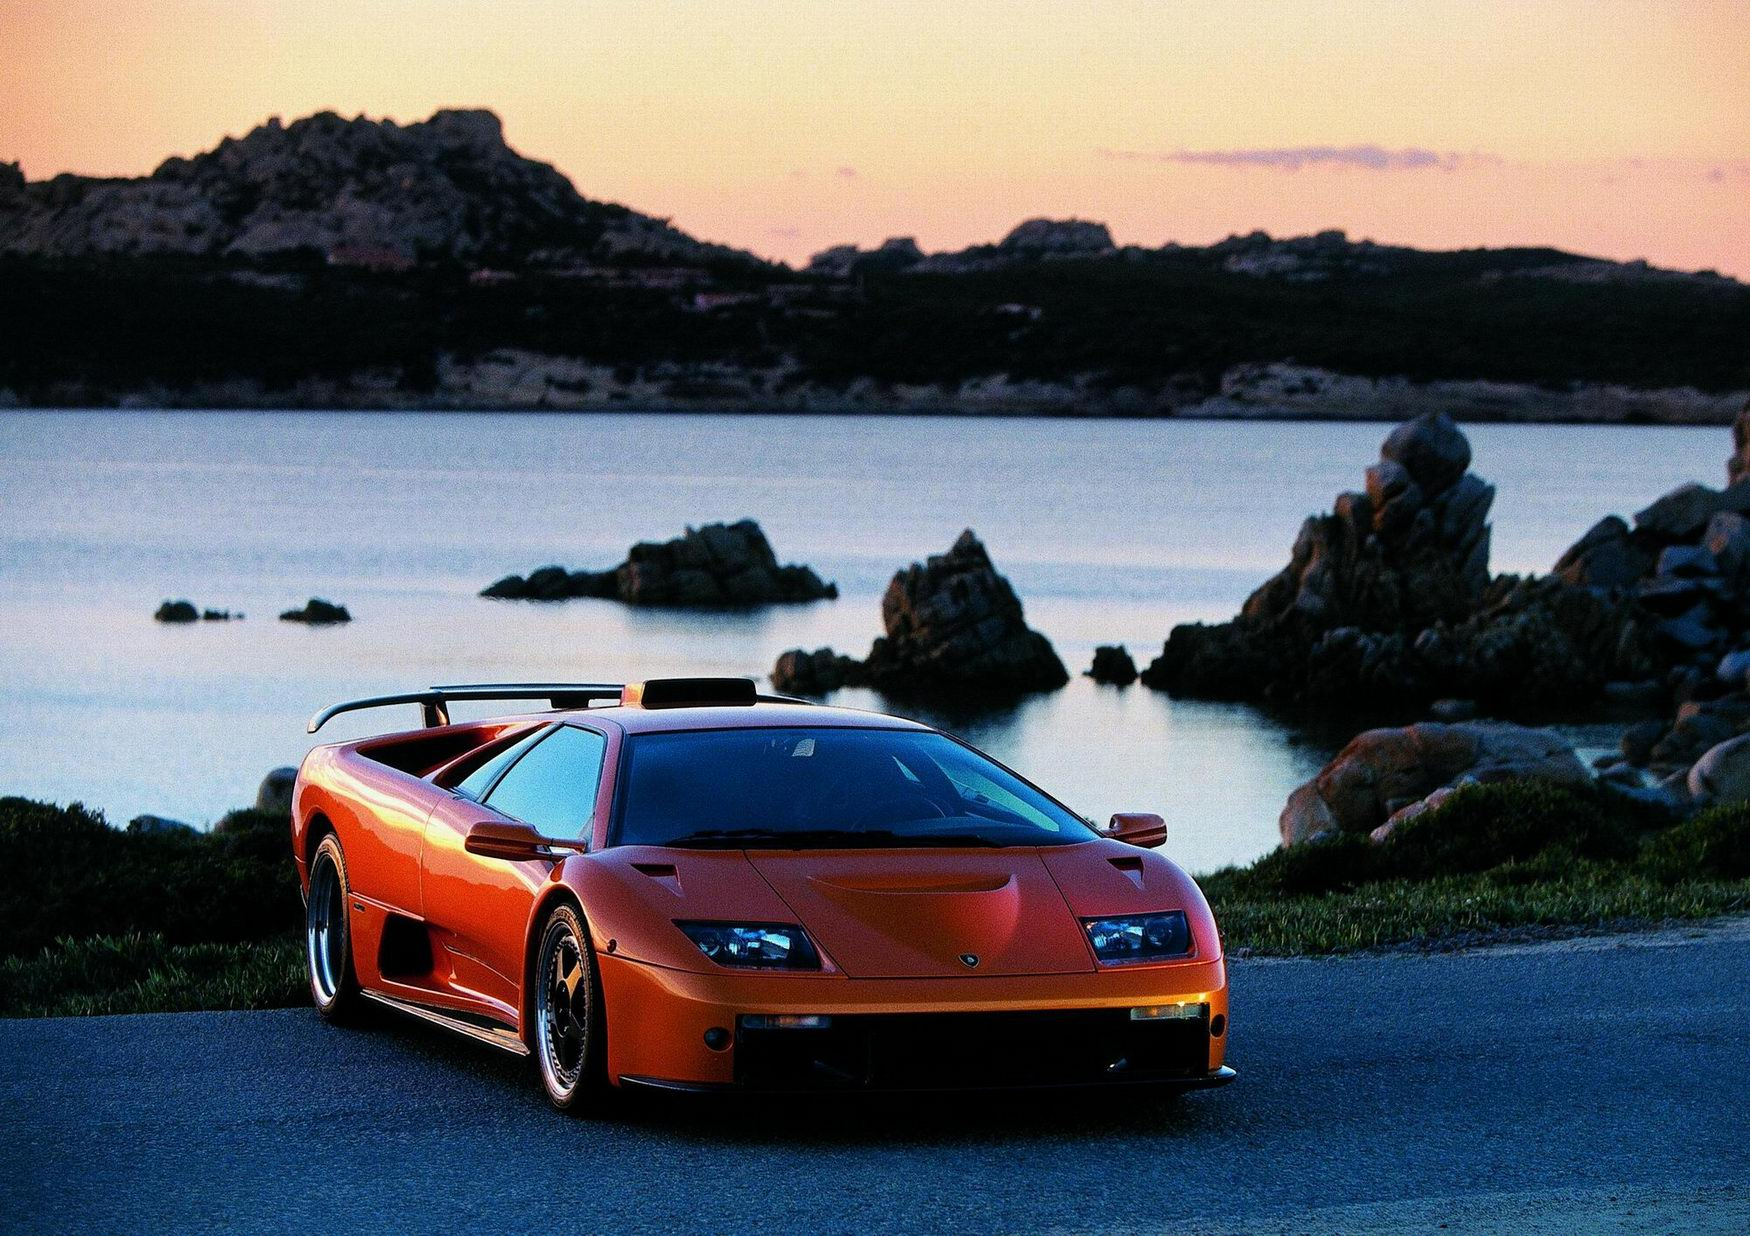 Lamborghini Diablo Gt Photos Photogallery With 12 Pics